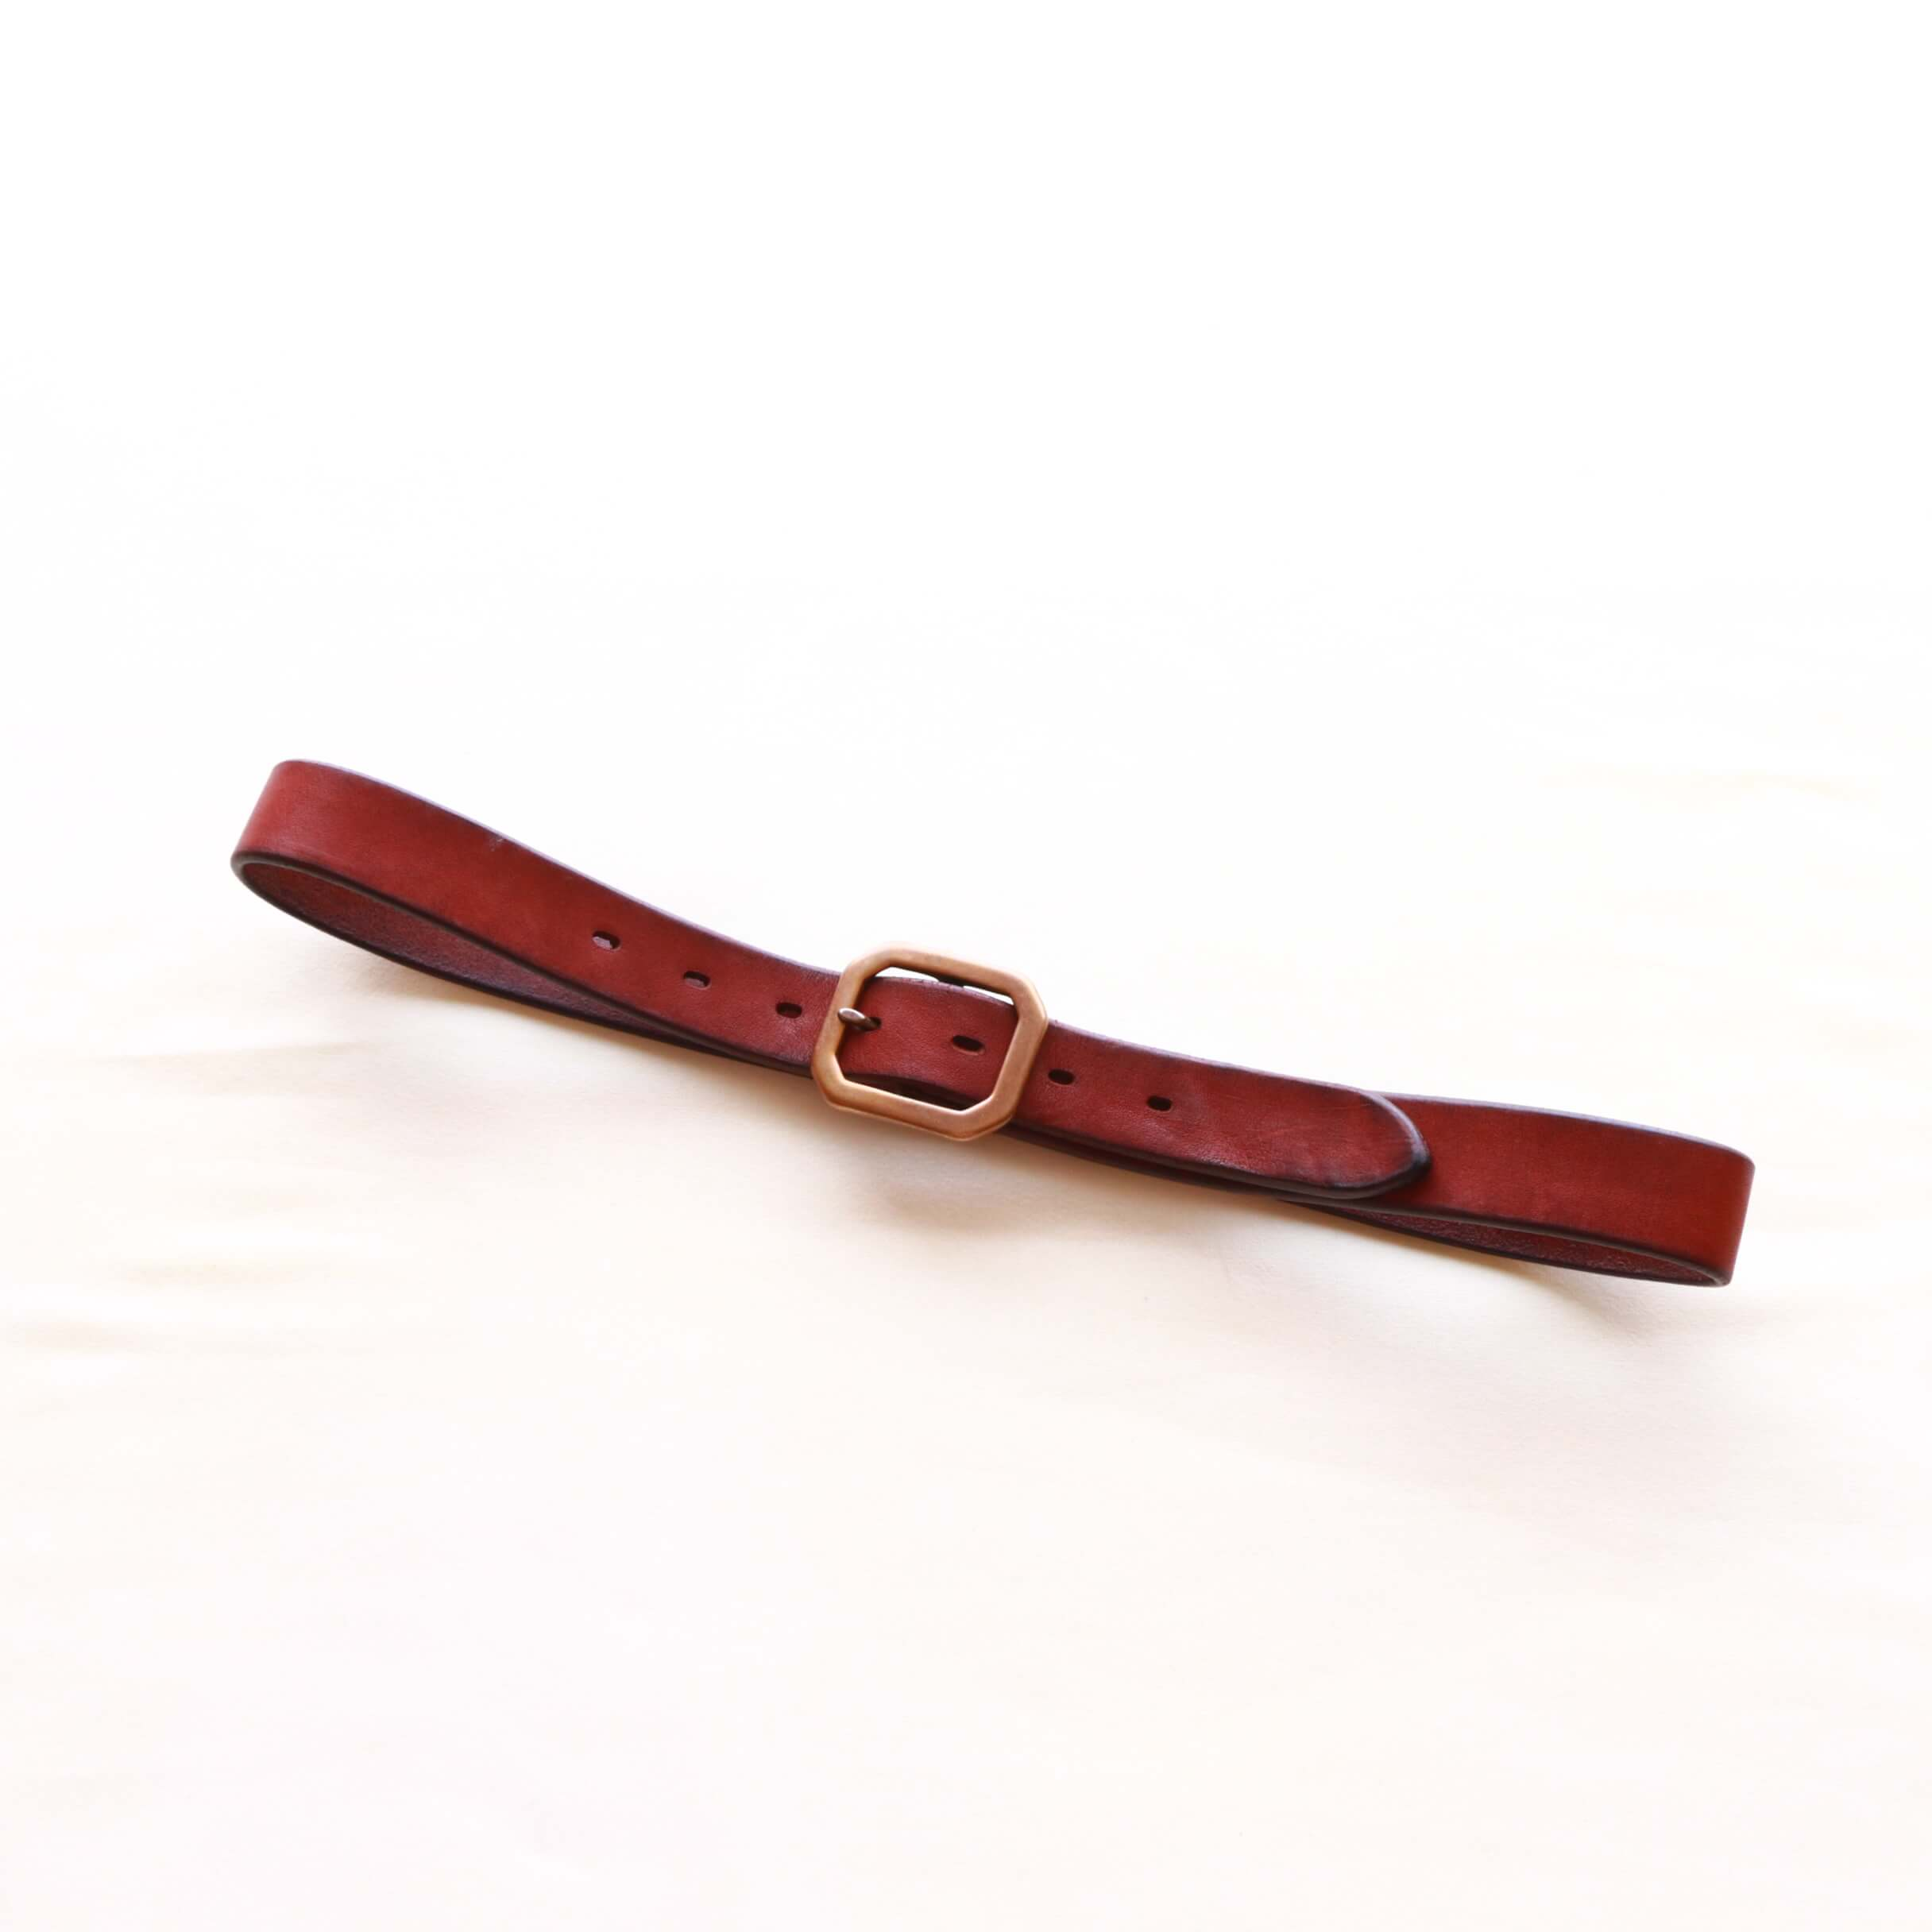 Vintage Works ヴィンテージワークス Leather belt 7Hole レザーベルト 7ホール DH5726